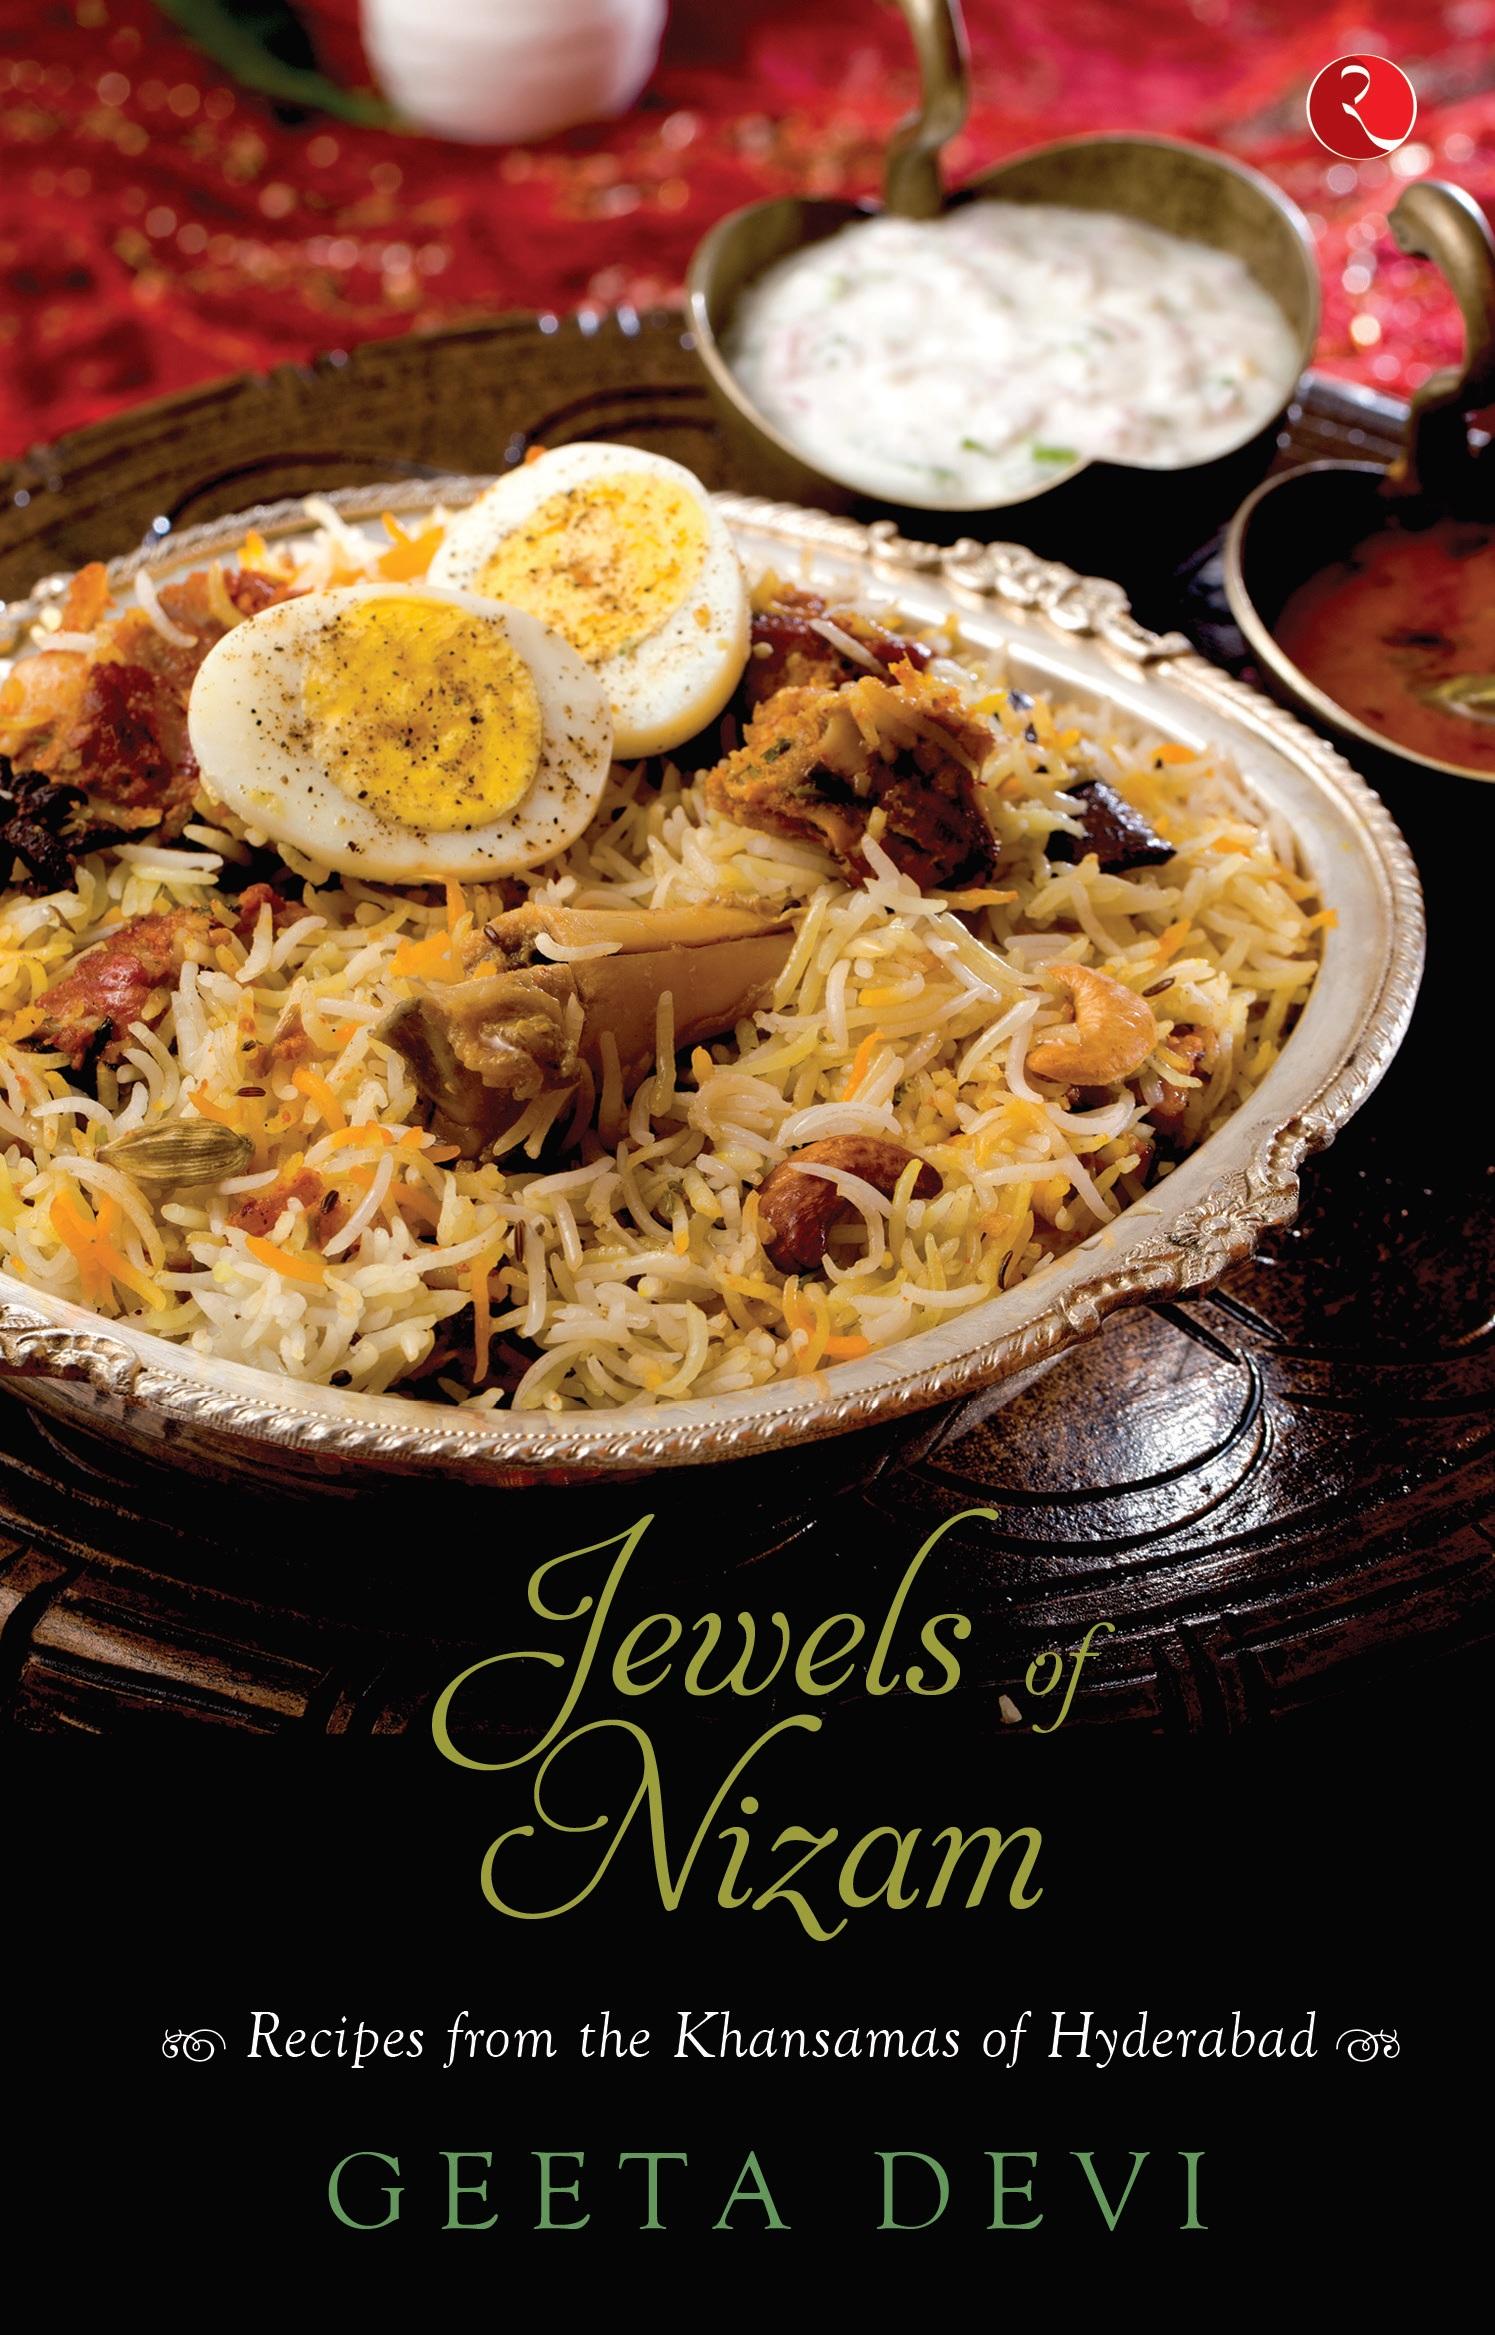 The jewels of nizam recipes from the khansamas of hyderabad rupa the jewels of nizam recipes from the khansamas of hyderabad forumfinder Image collections